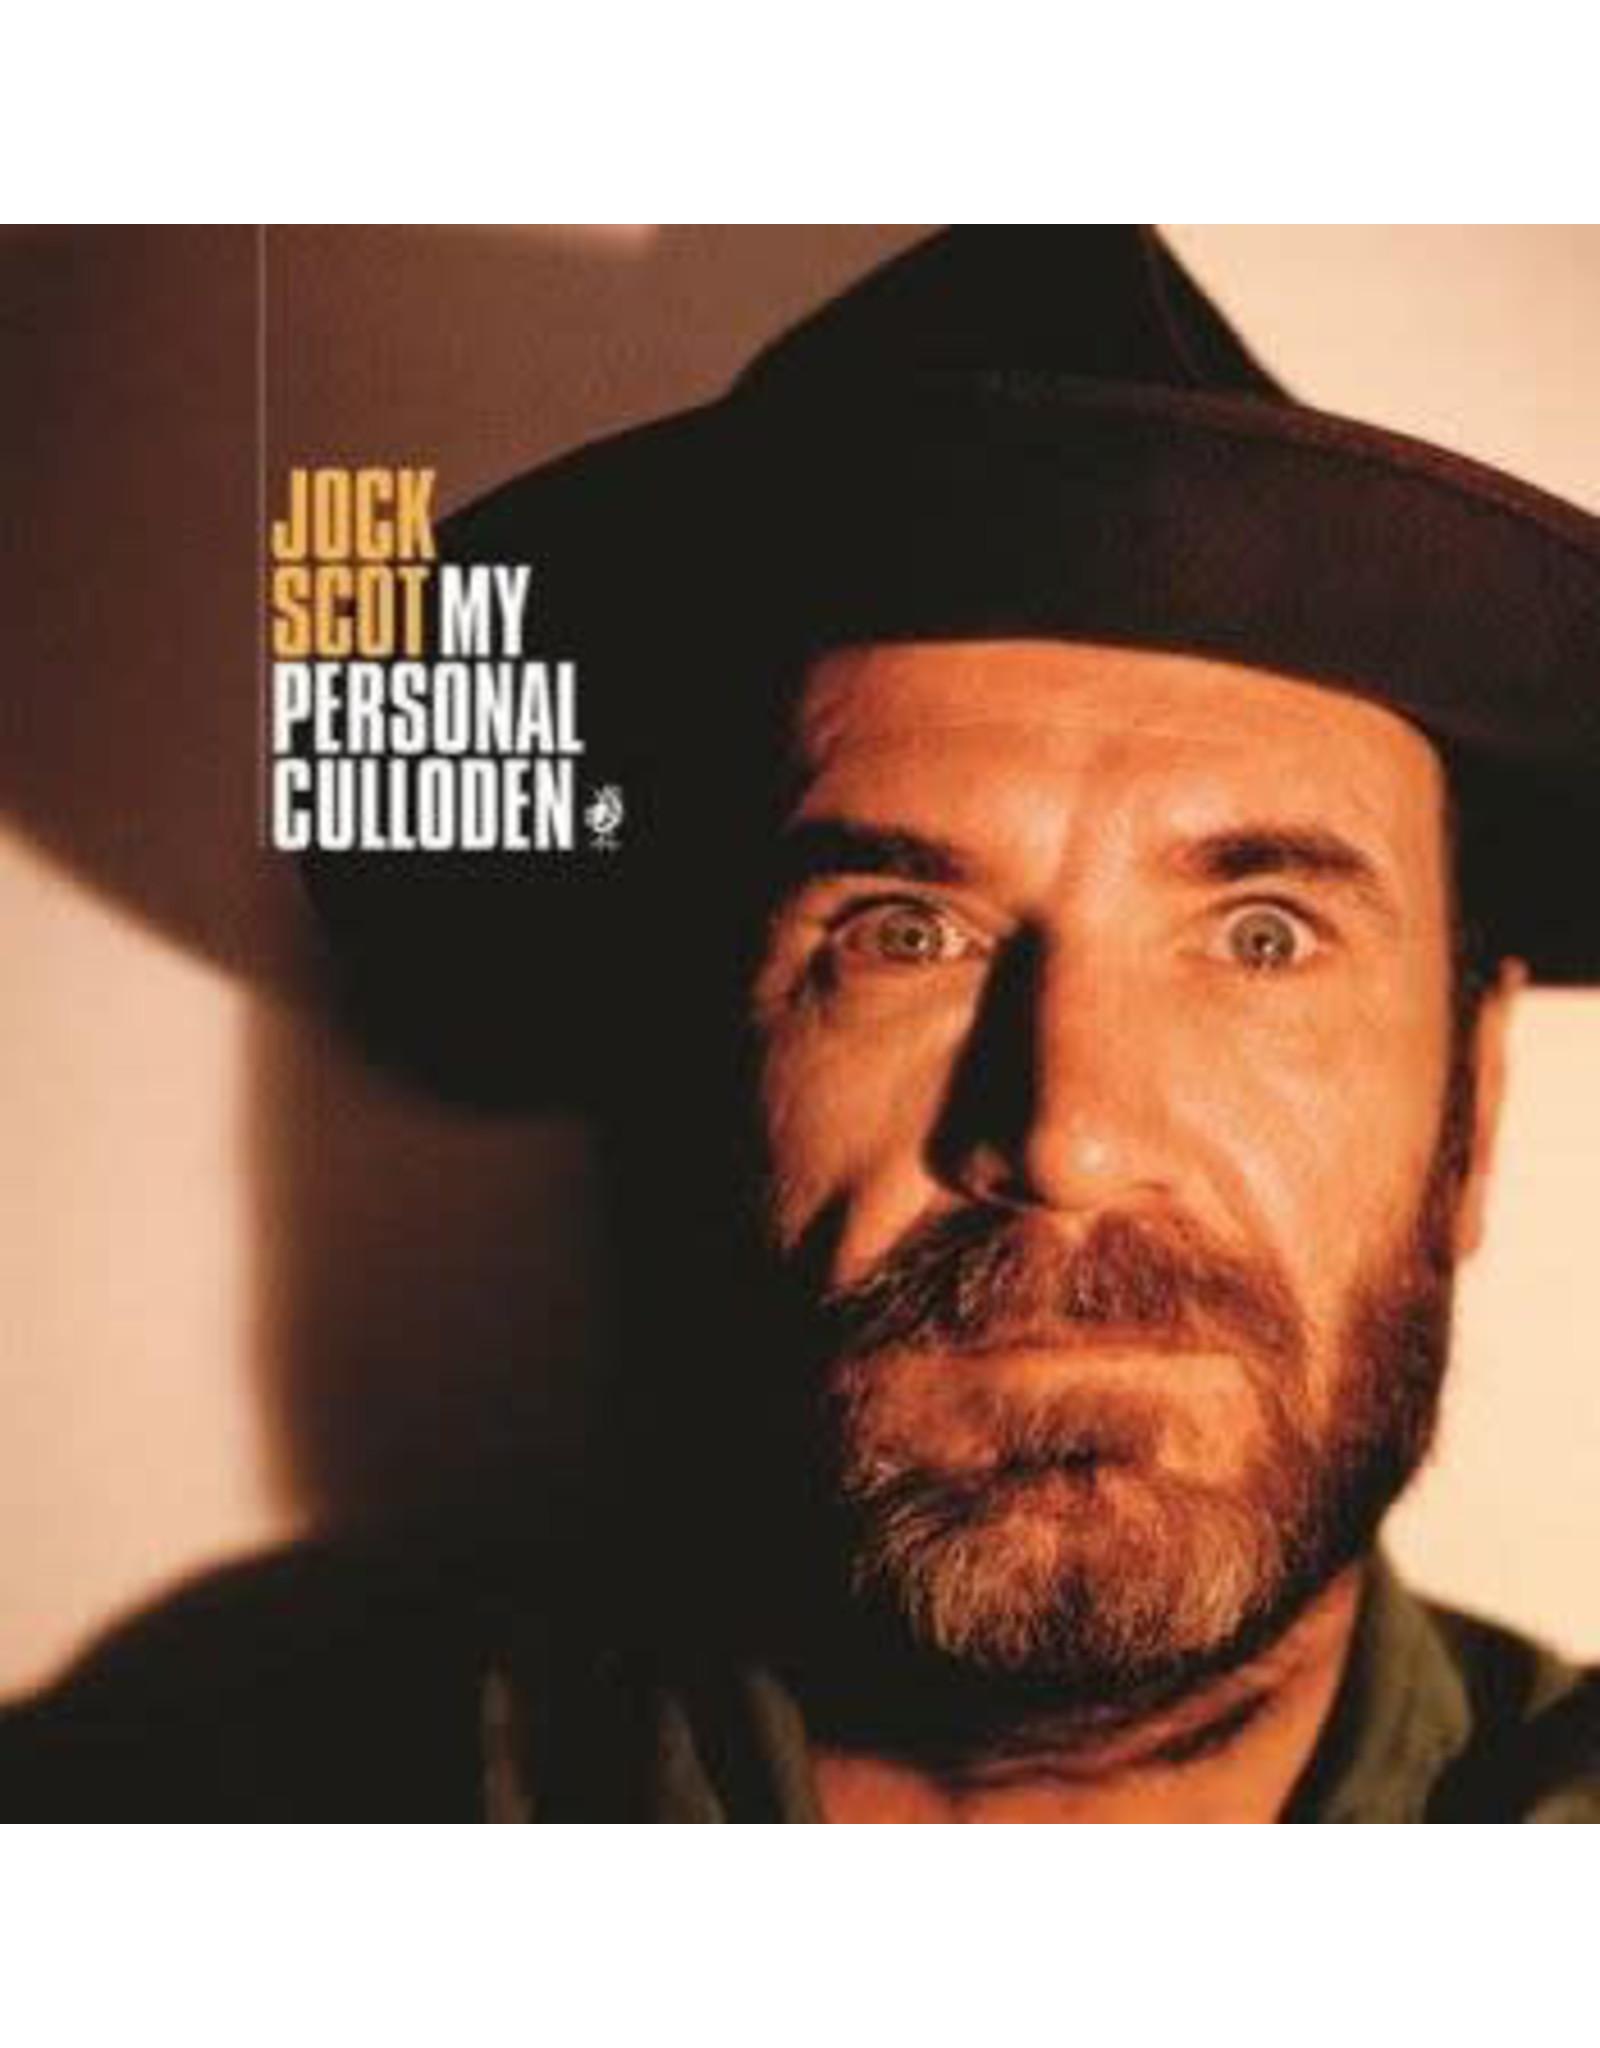 Scot, Jock - My Personal Culloden LP